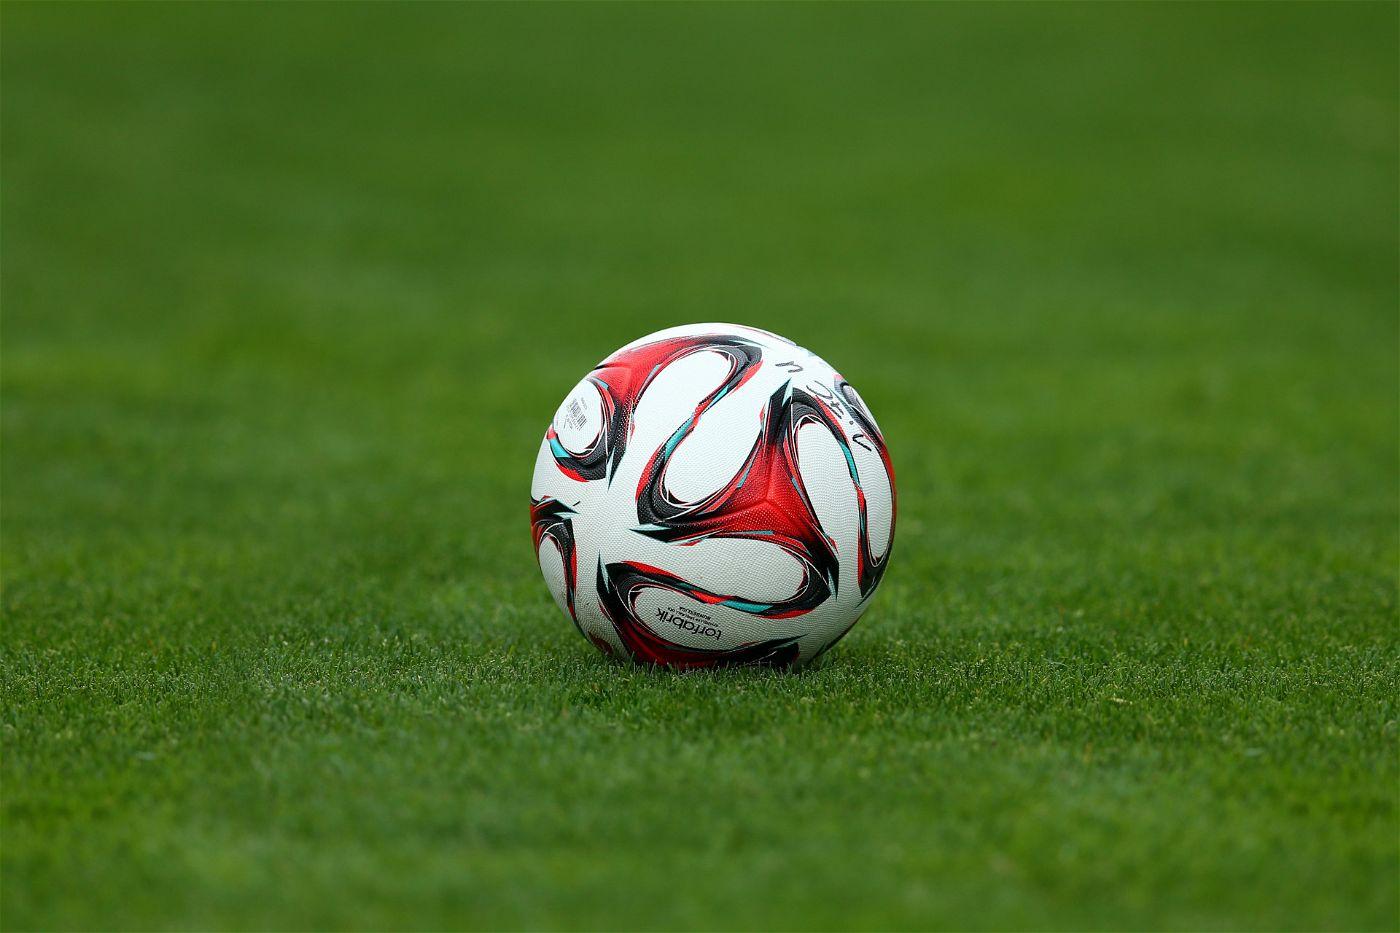 Sky Und Eurosport Bundesliga